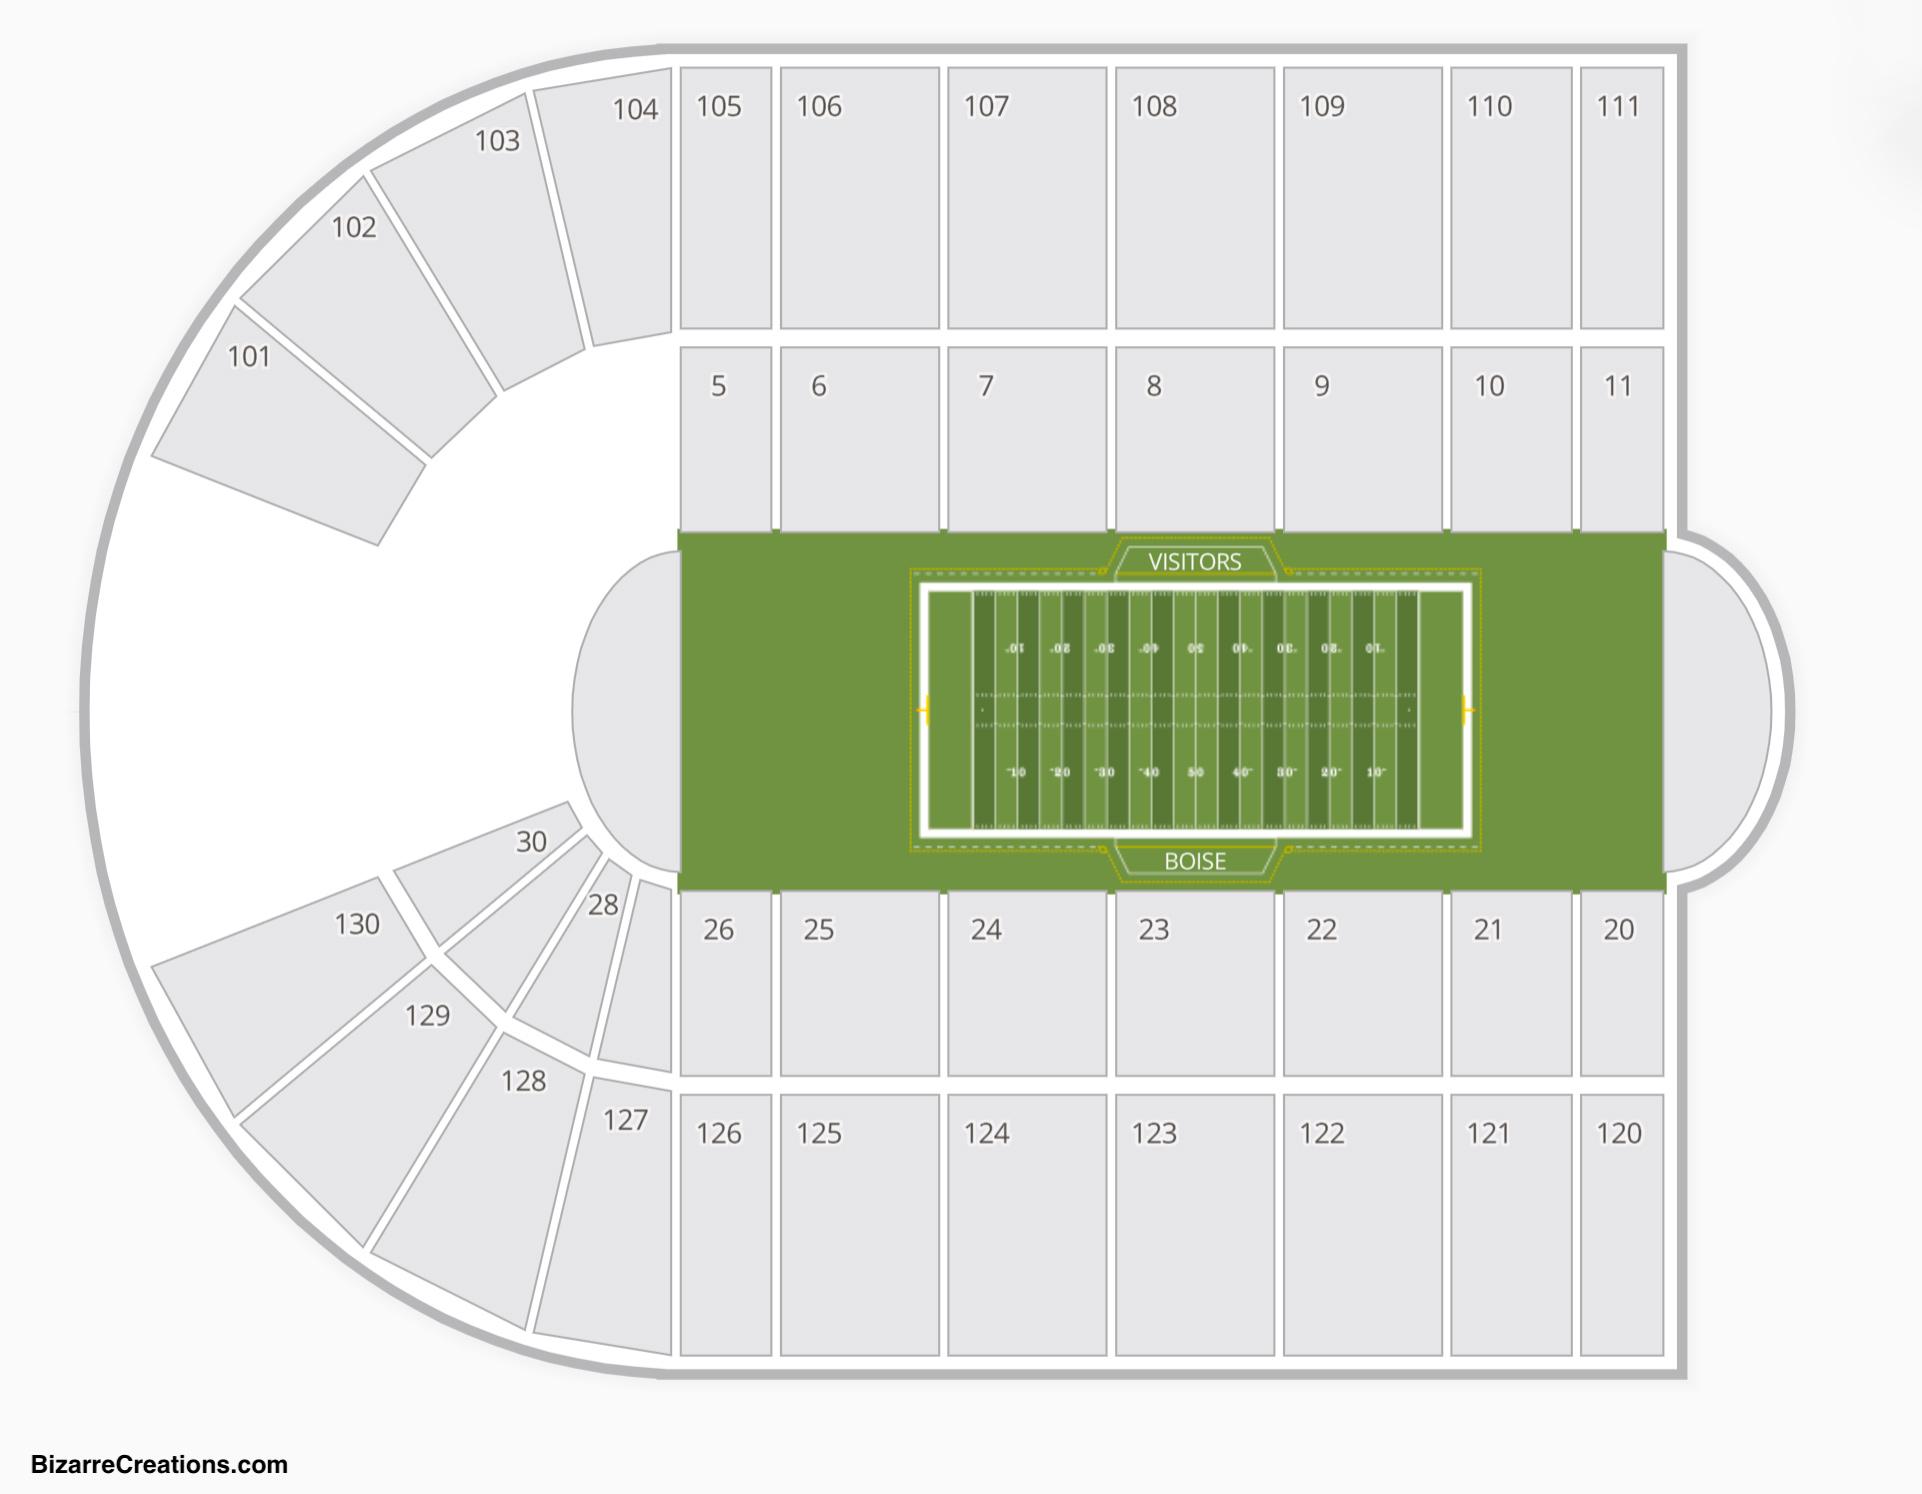 Albertsons Stadium Seating Chart | Seating Charts & Tickets